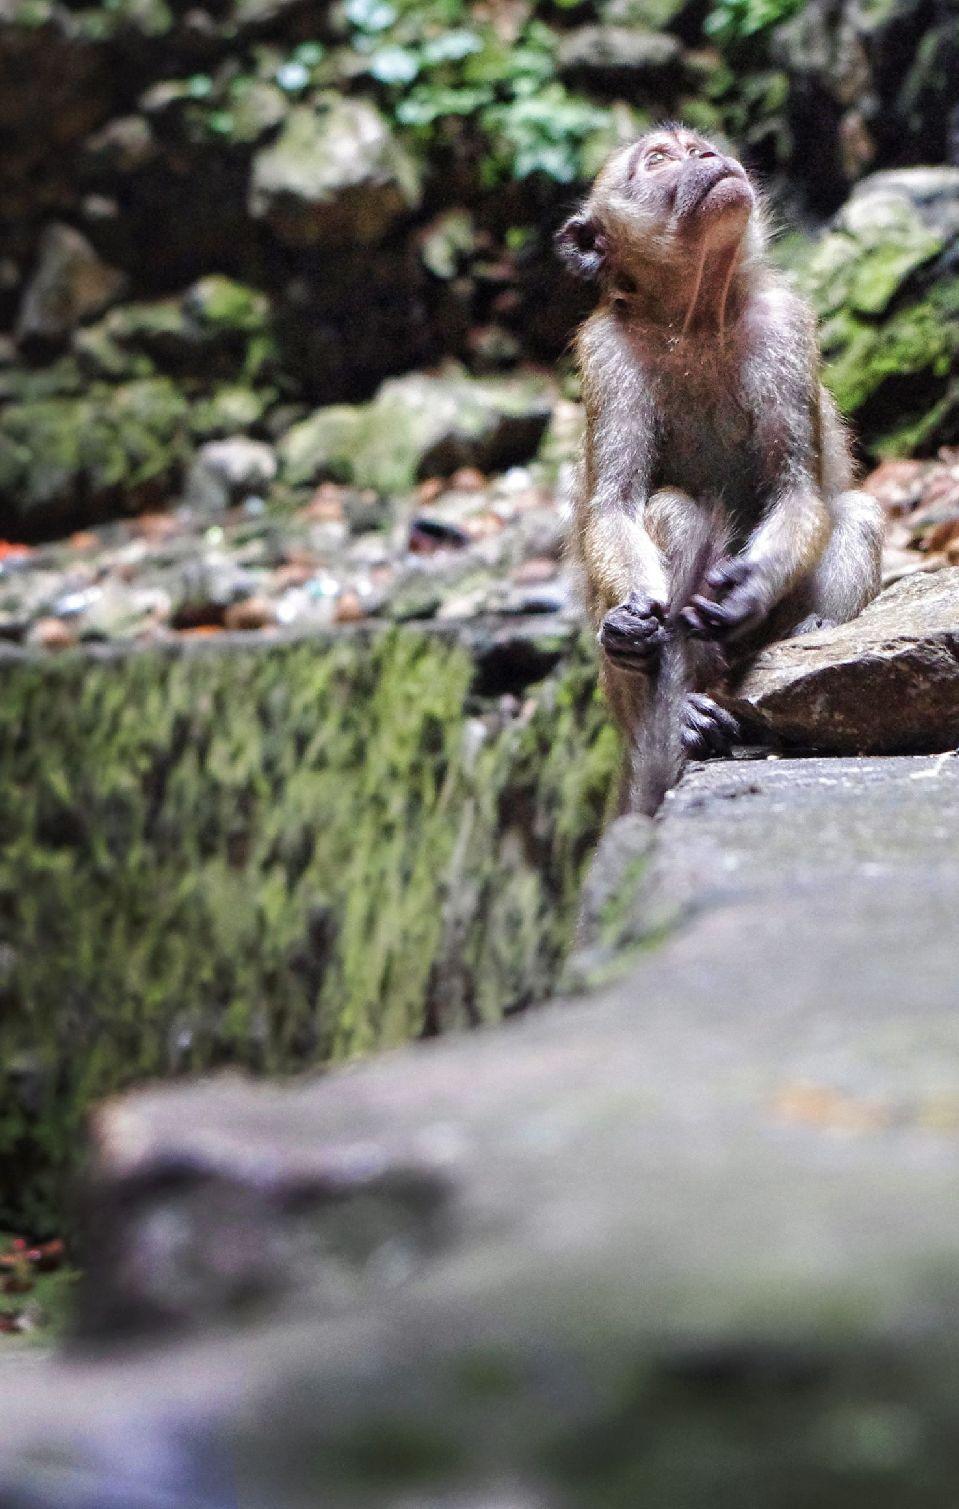 monkey comtemplating ashton morris